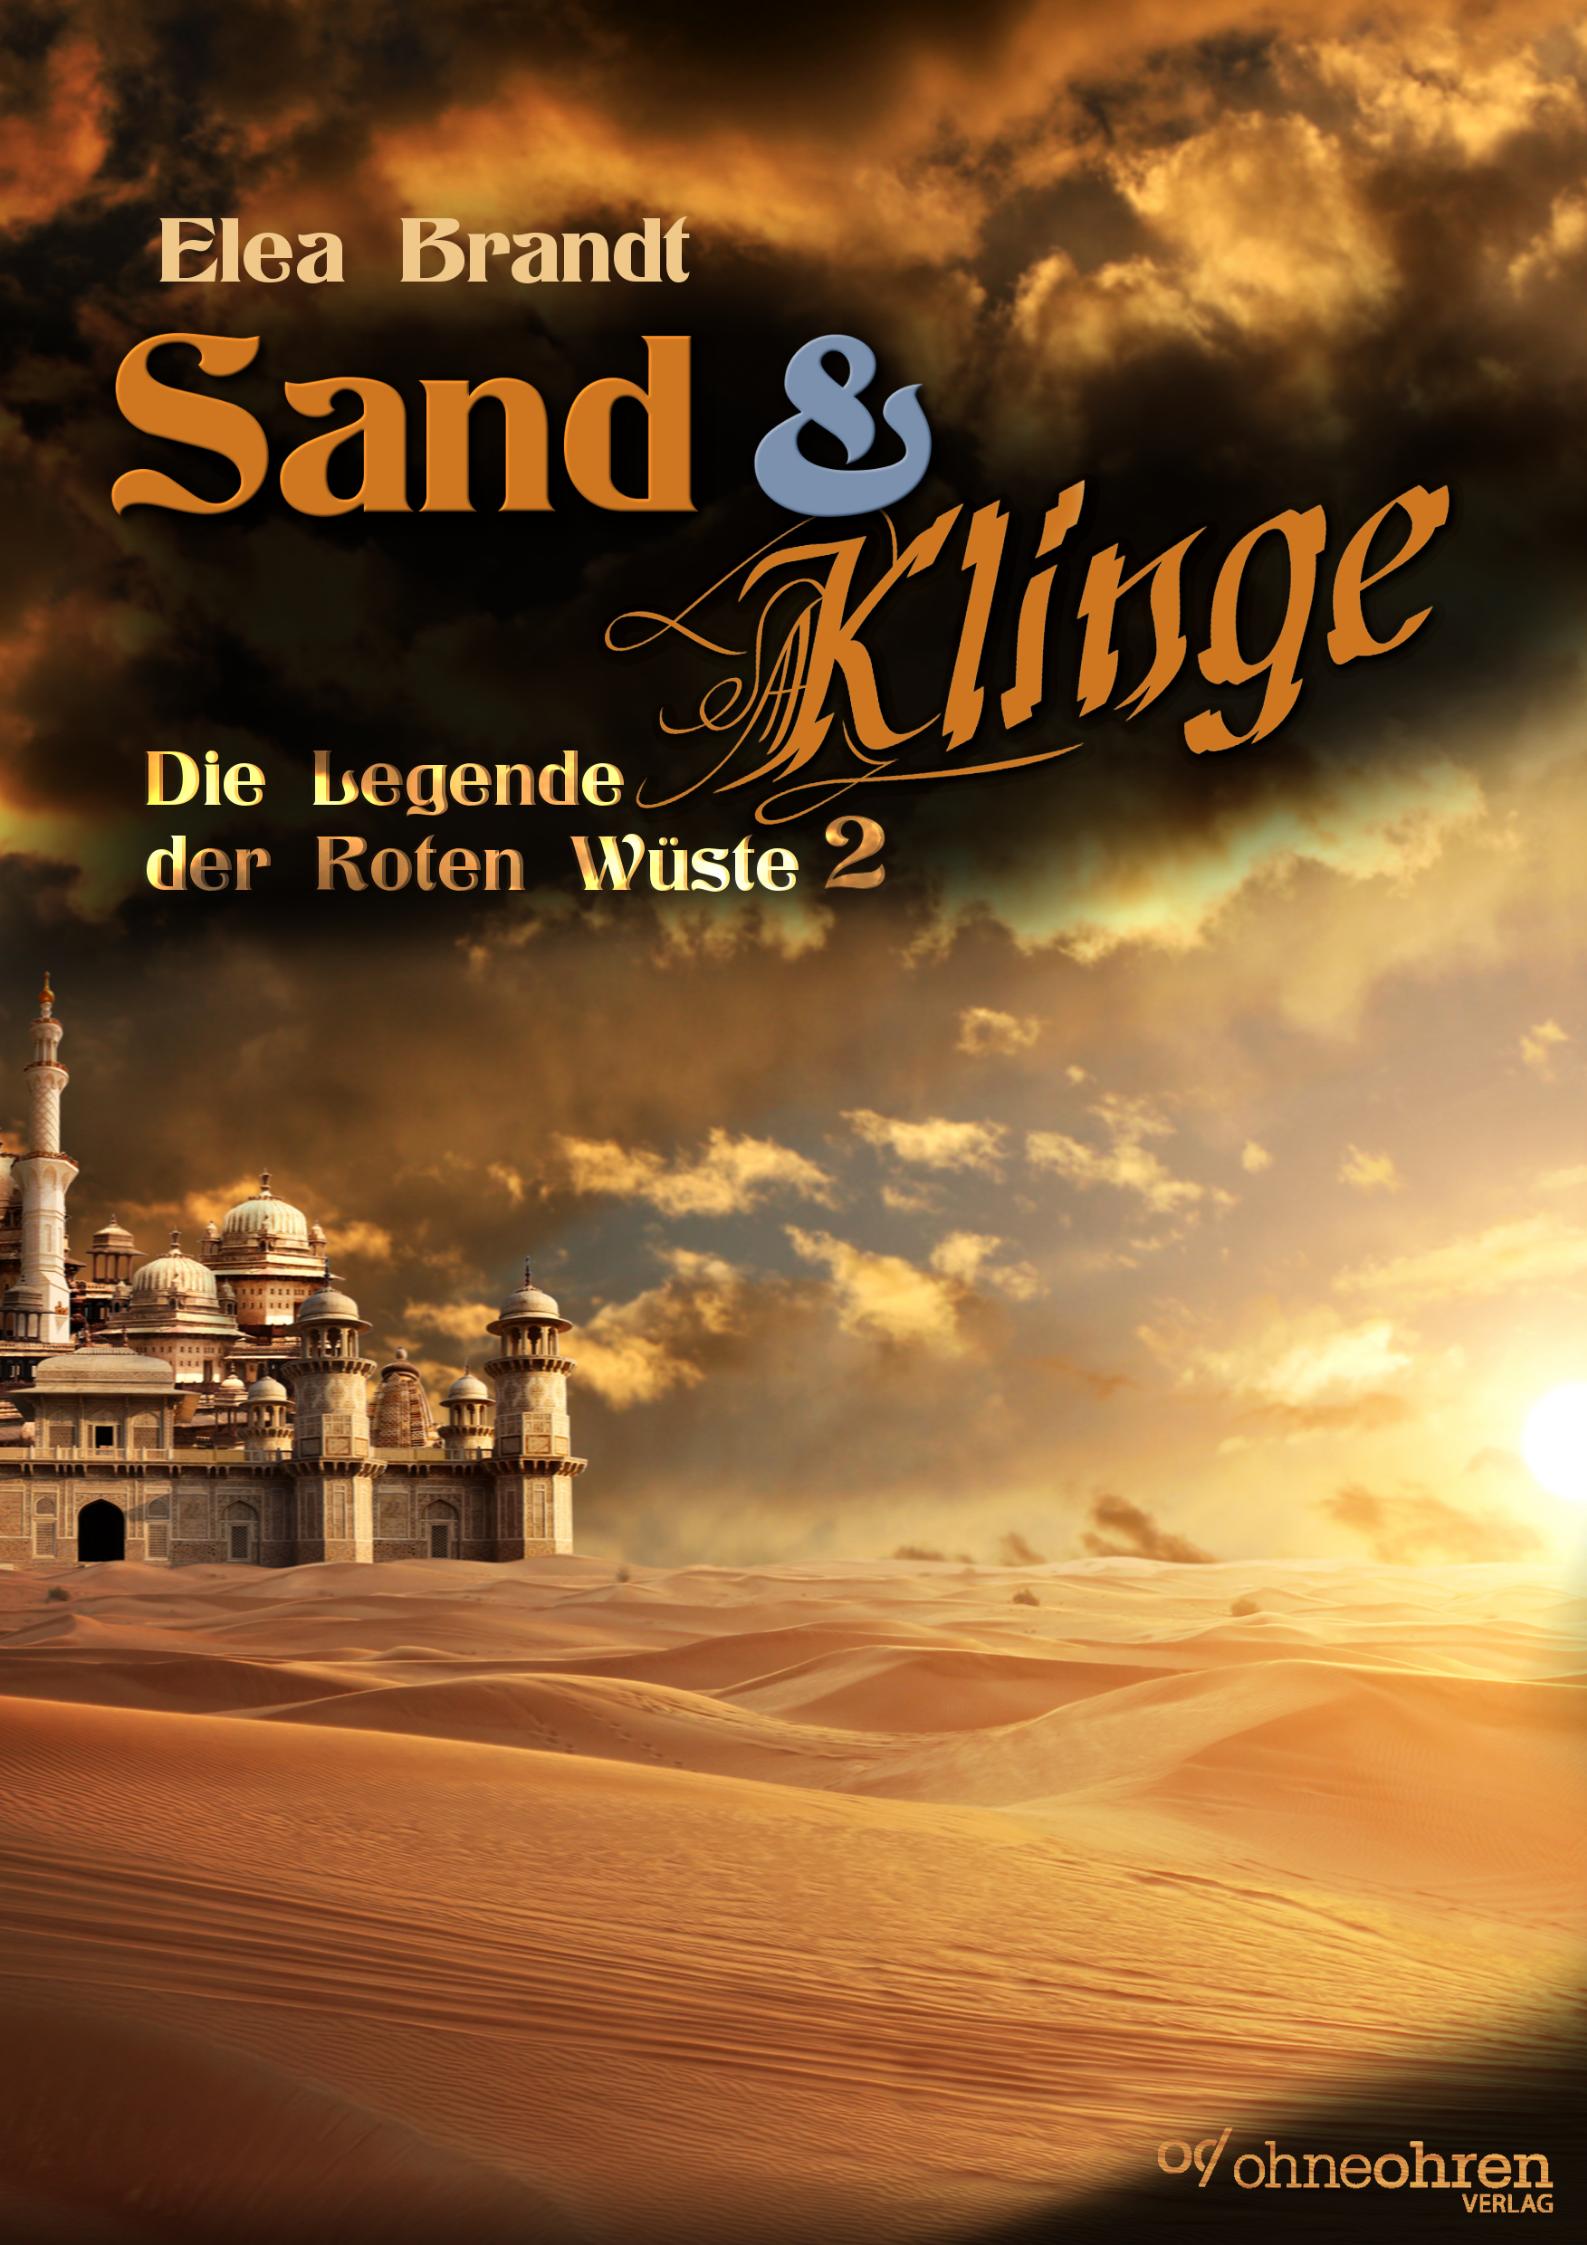 Brandt_Elea_Sand_&_Klinge_phantastik-autoren-netzwerk.png